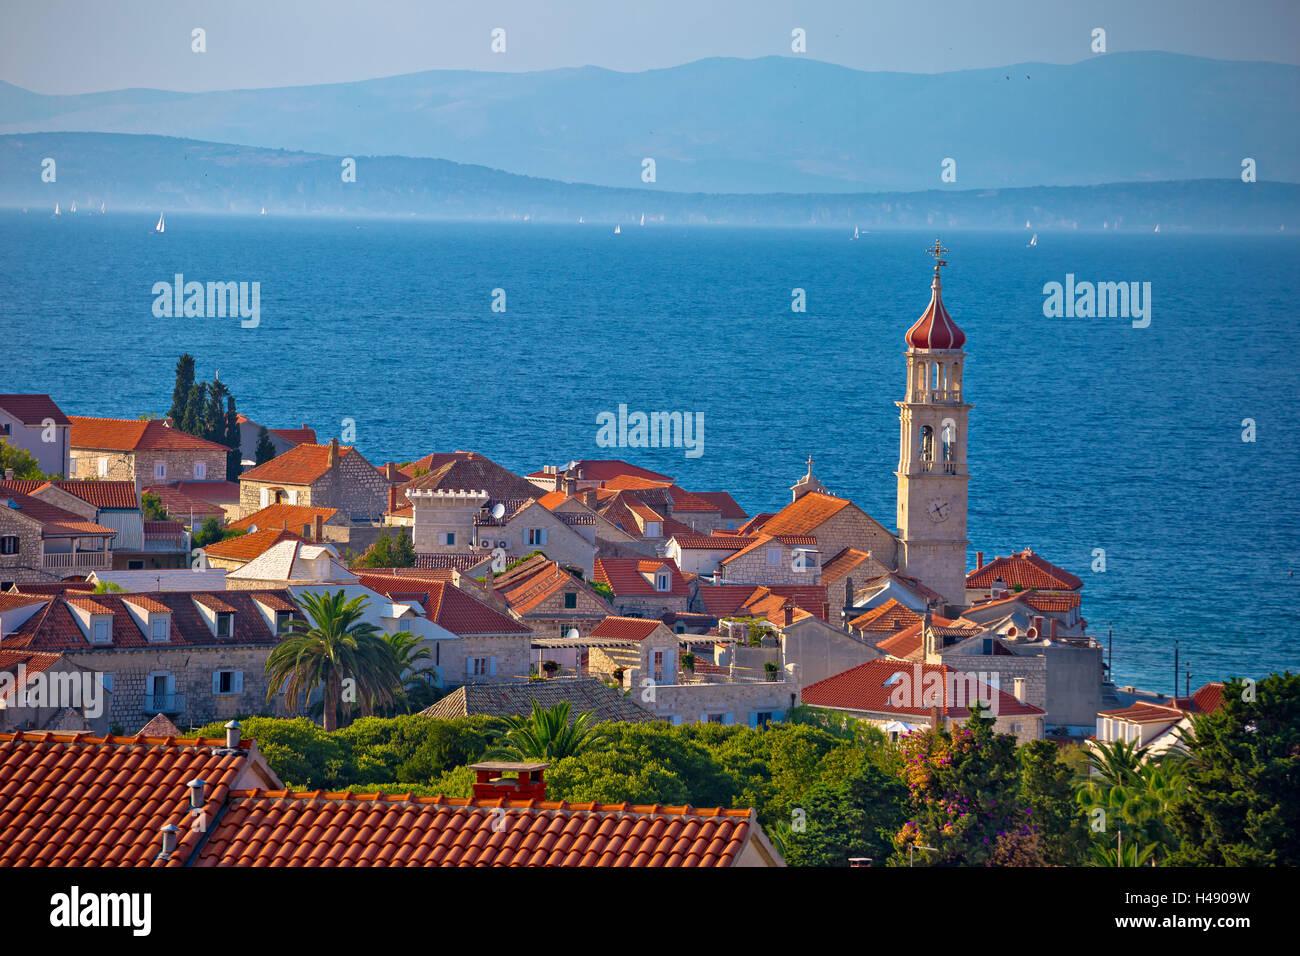 Skyline-Blick Stadt Sutivan, Insel Brac, Kroatien Stockfoto